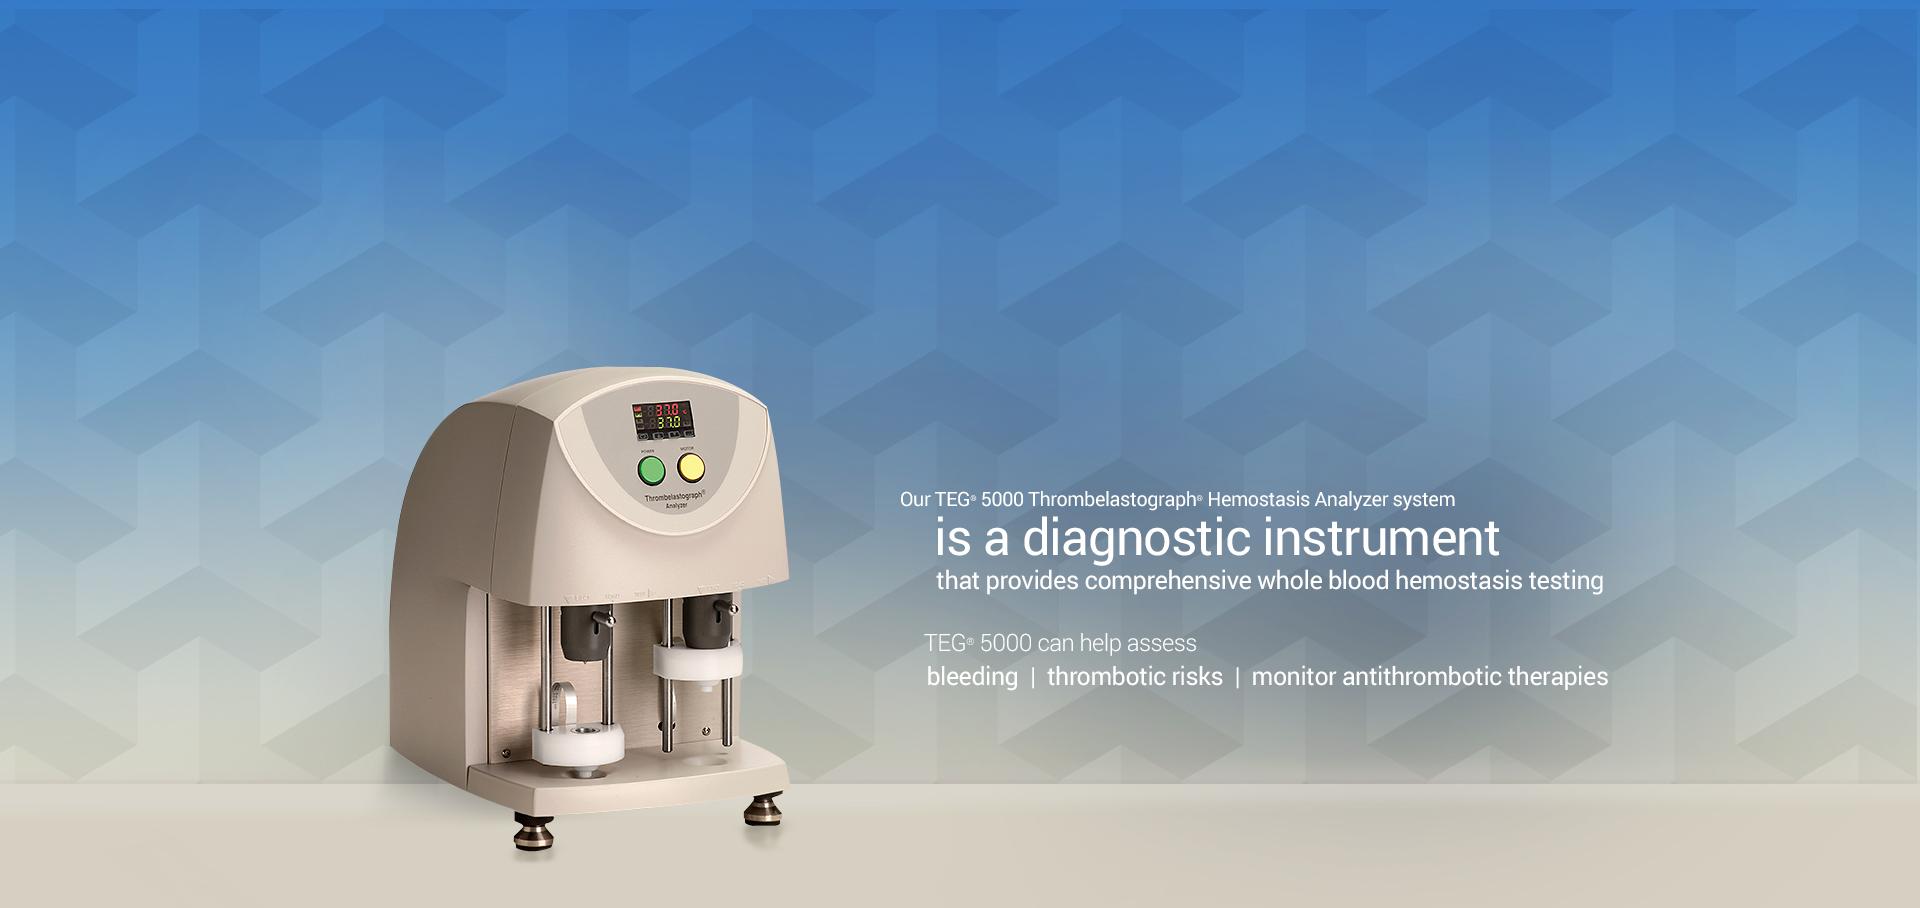 TEG 5000 Thrombelastograph Hemostasis Analyzer system